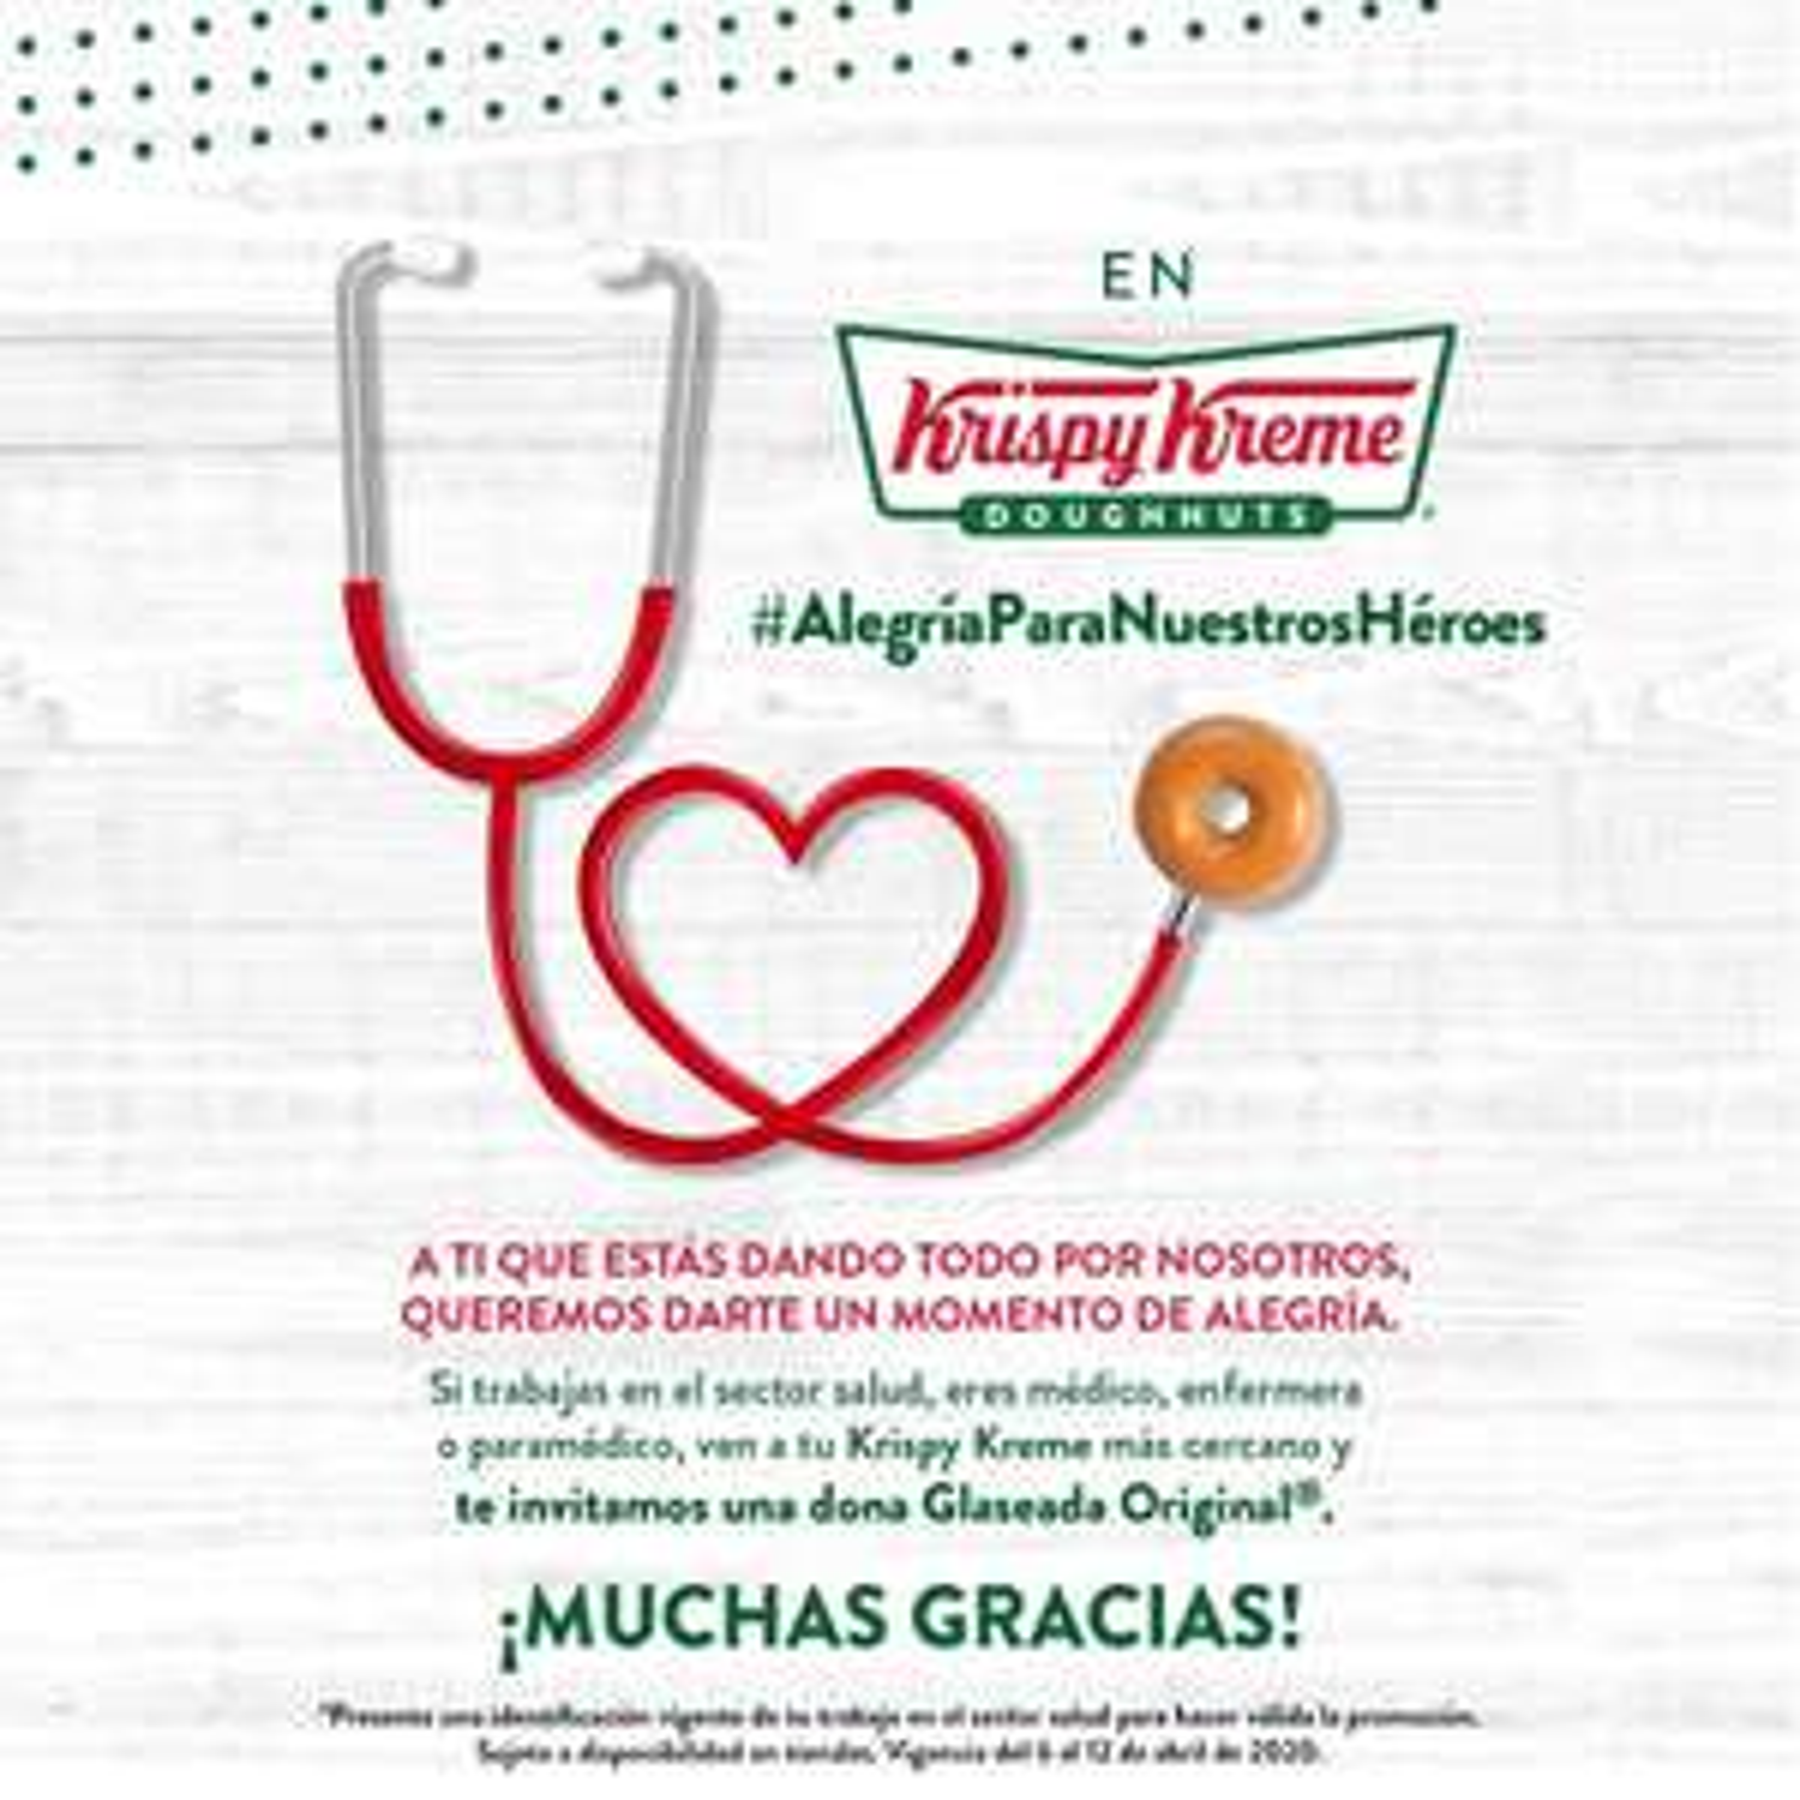 Krispy Kreme: Dona Glaseada Original Gratis si trabajas en el Sector Salud